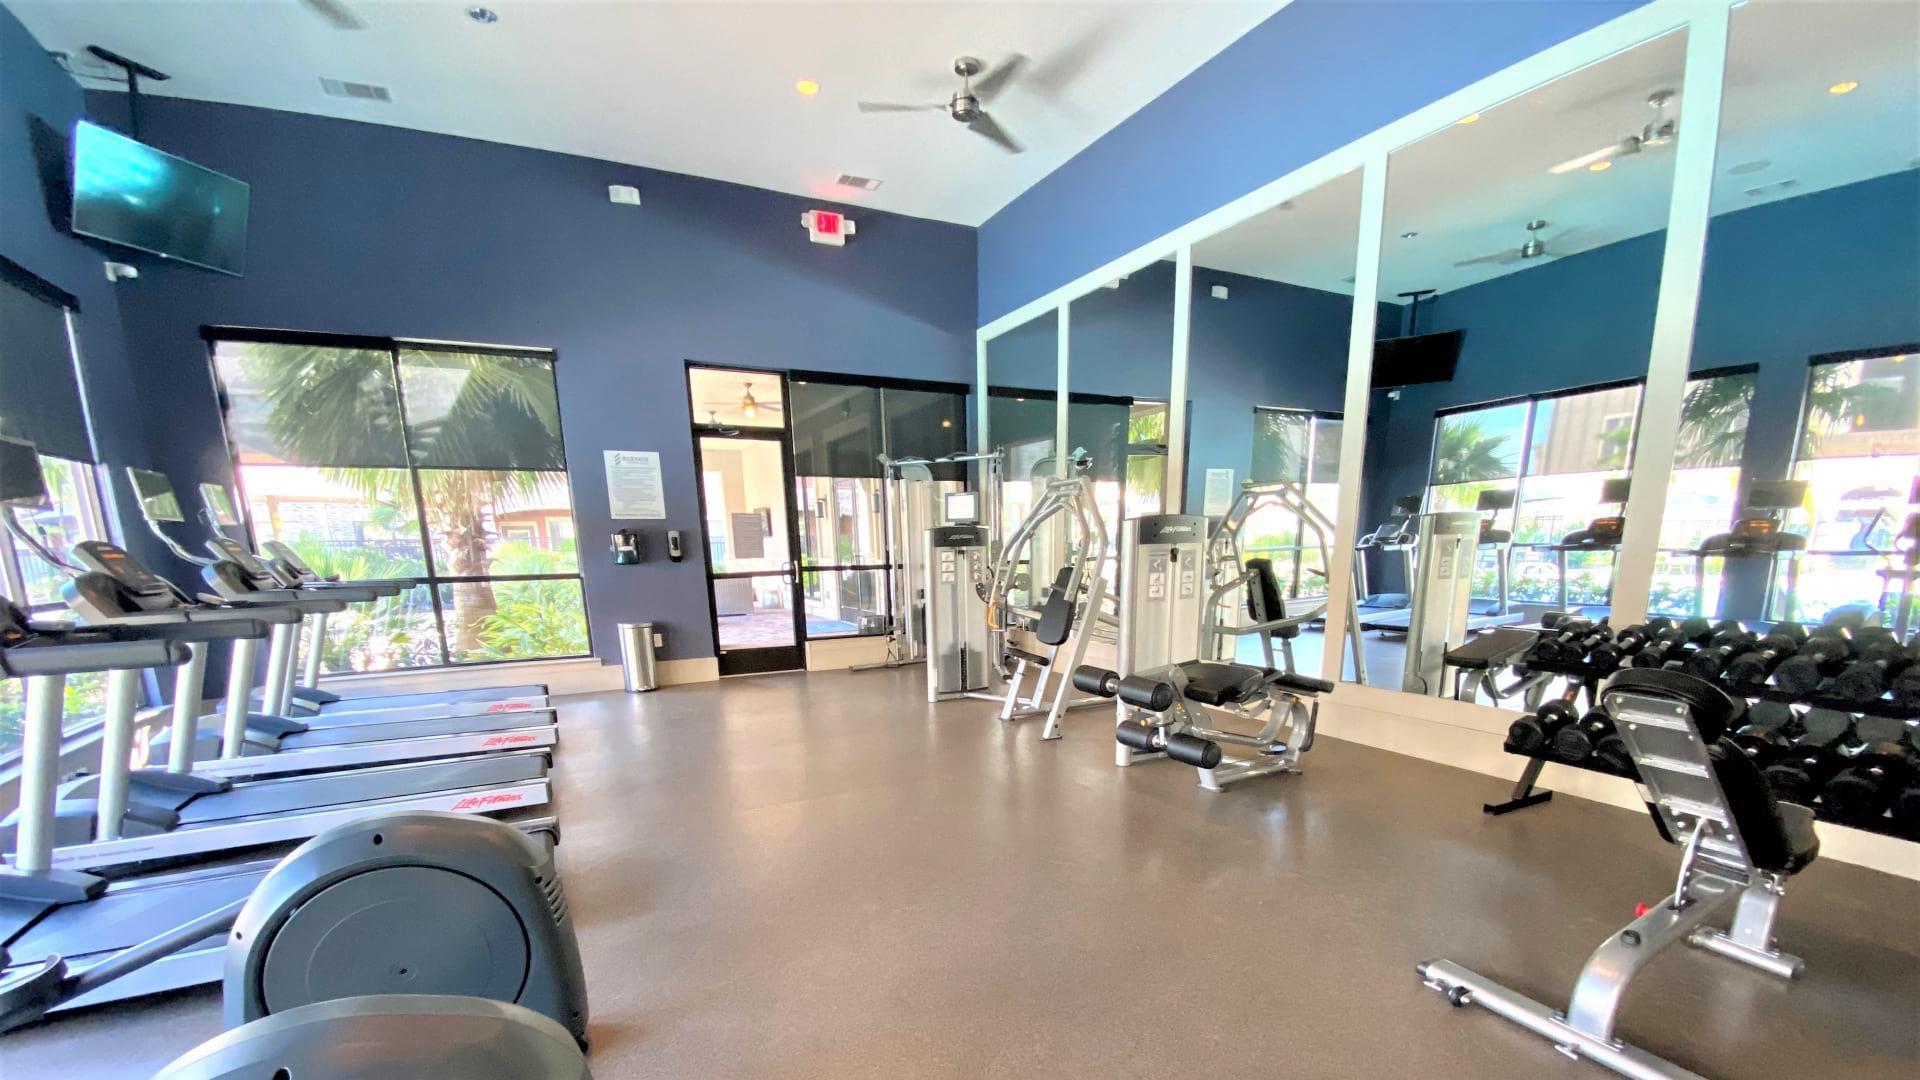 Apartment gym at Cortland Spring Cypress